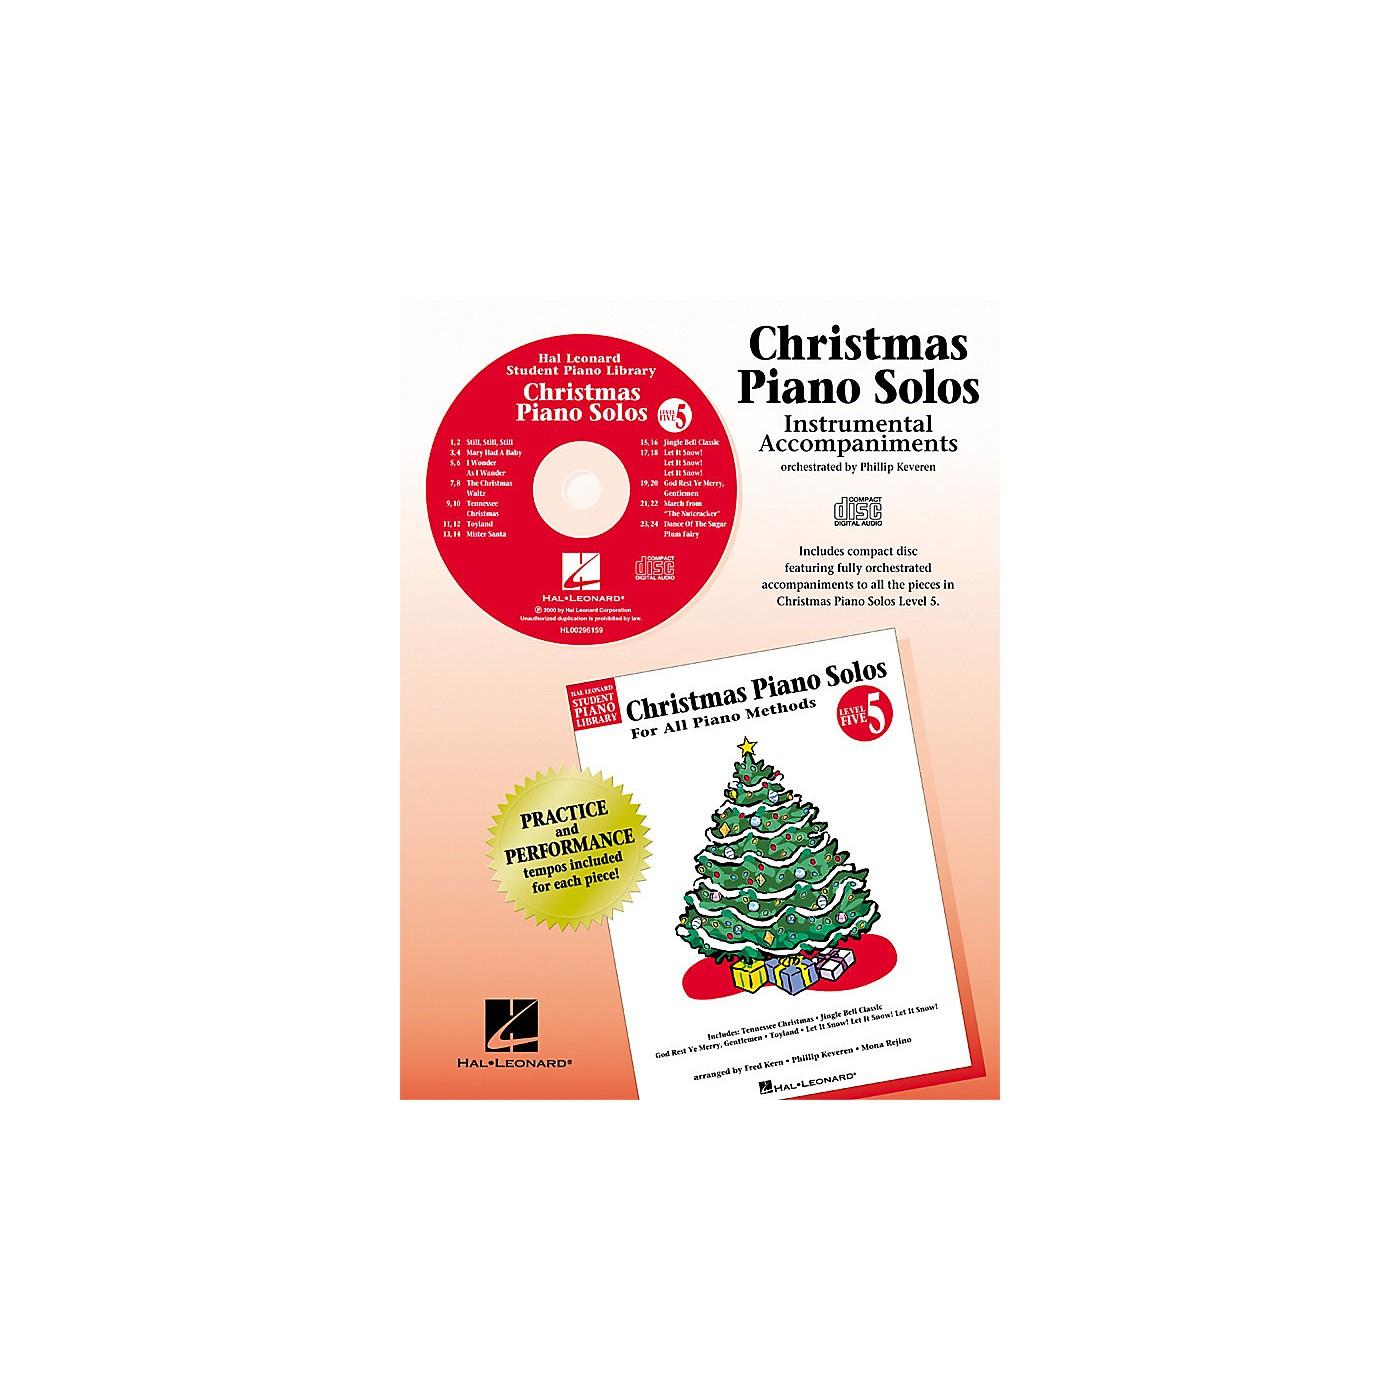 Hal Leonard Christmas Piano Solos - Level 5 - CD Piano Library Series CD thumbnail